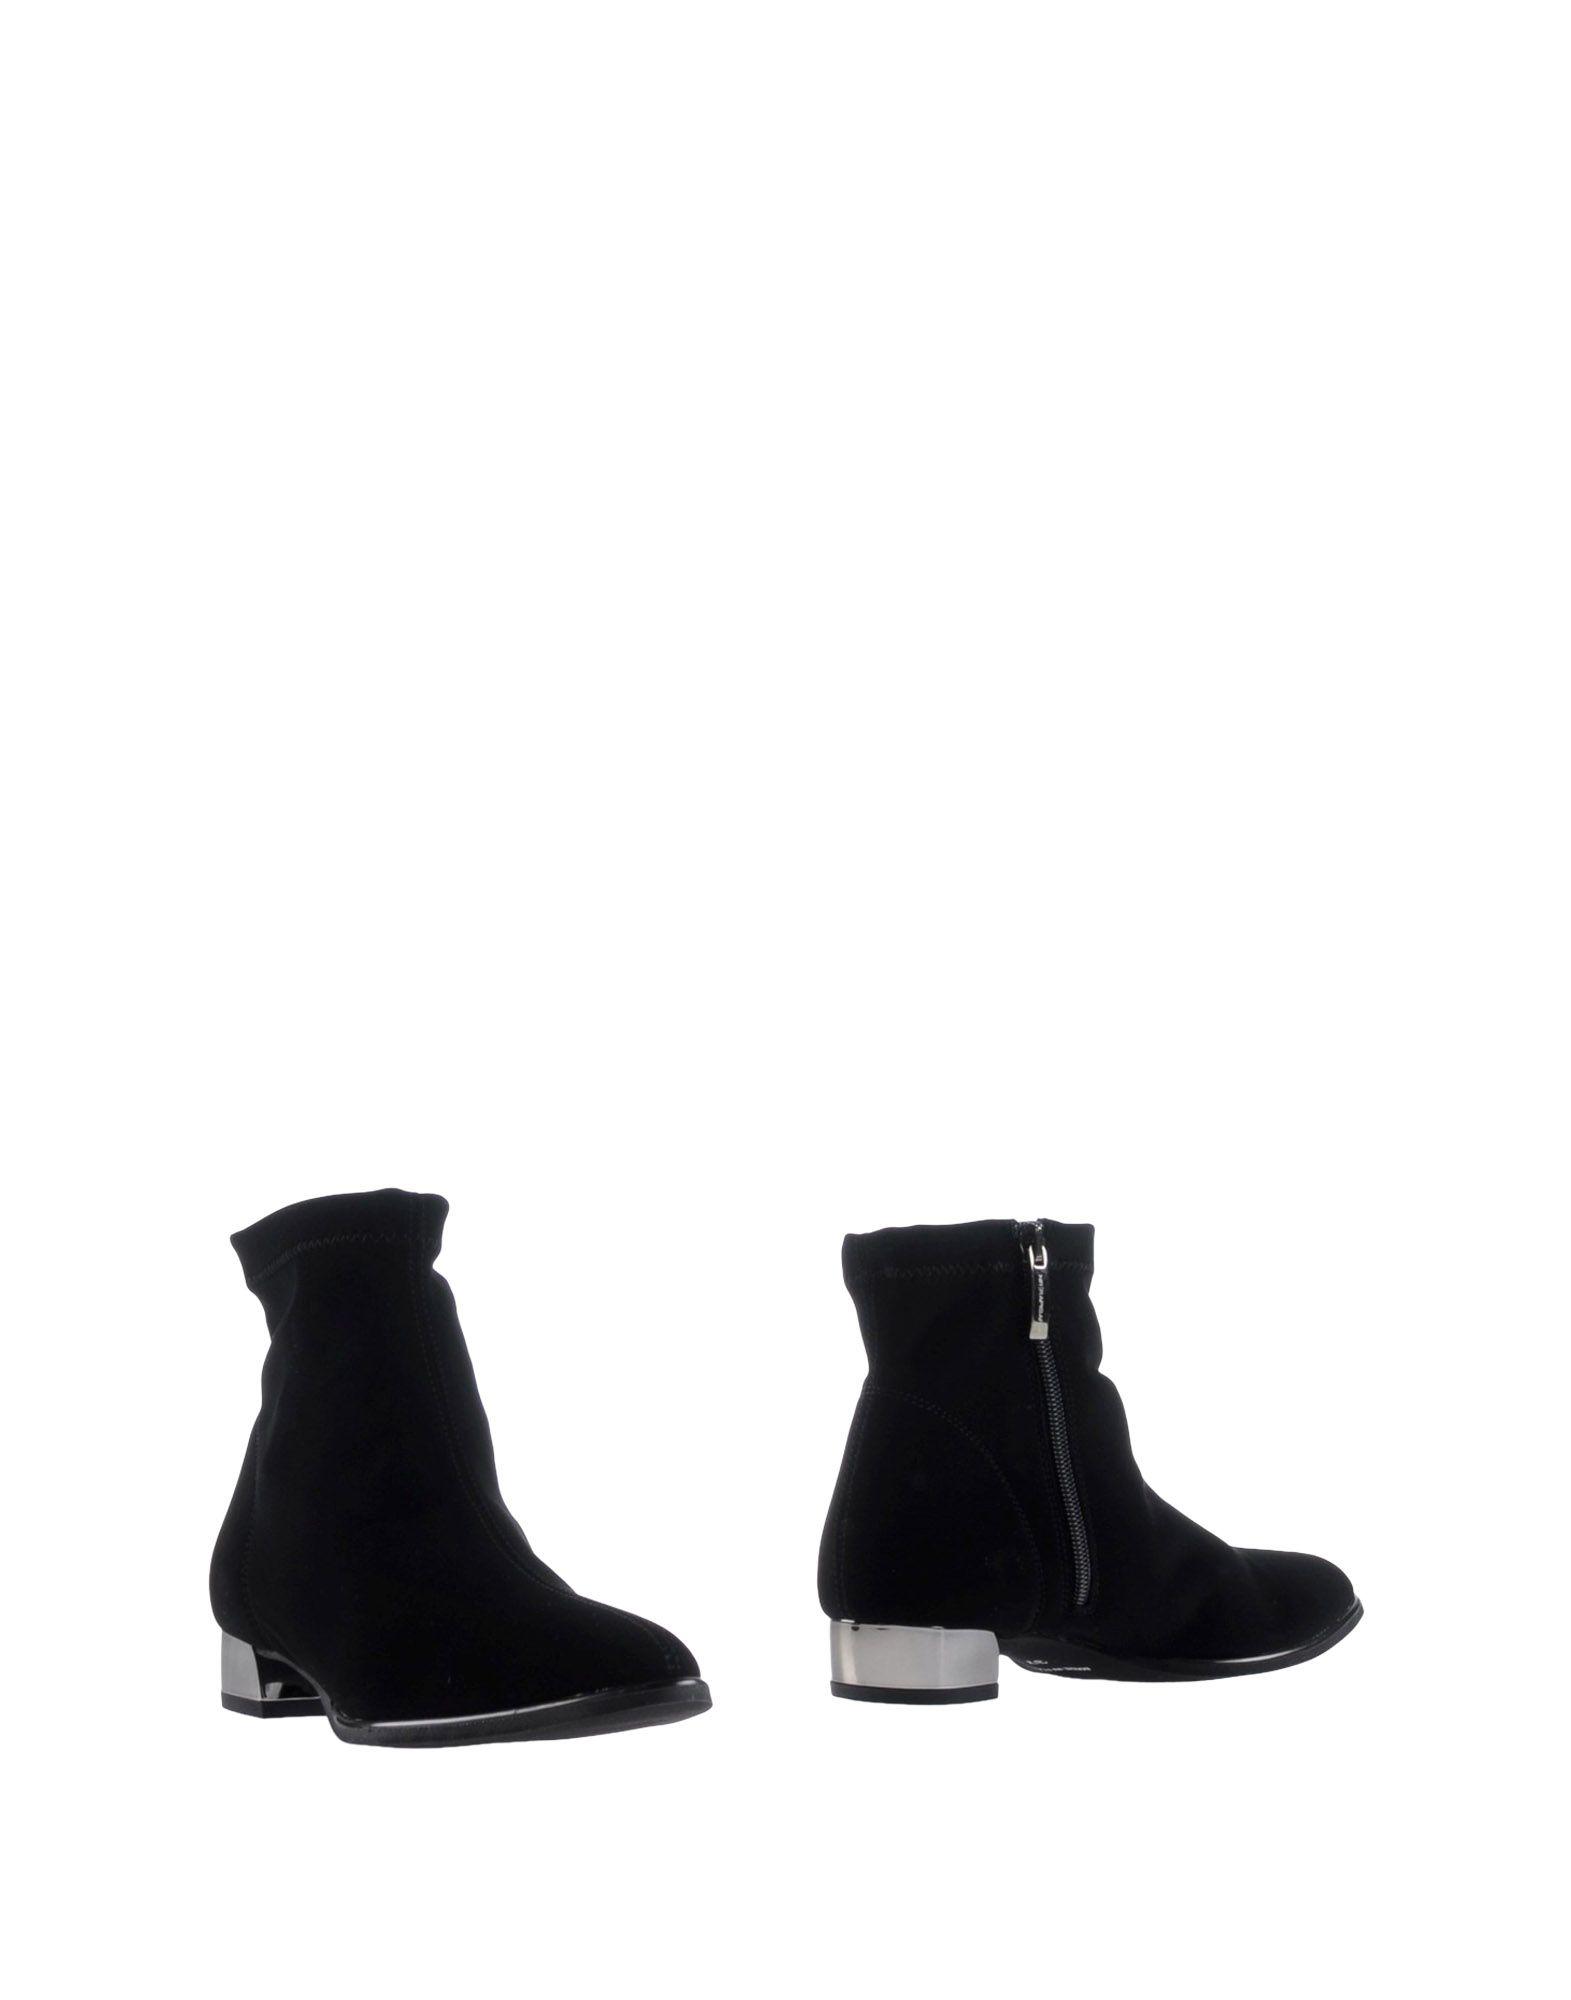 Nr Nr Nr Rapisardi Stiefelette Damen  11048520OO Gute Qualität beliebte Schuhe dde4bb